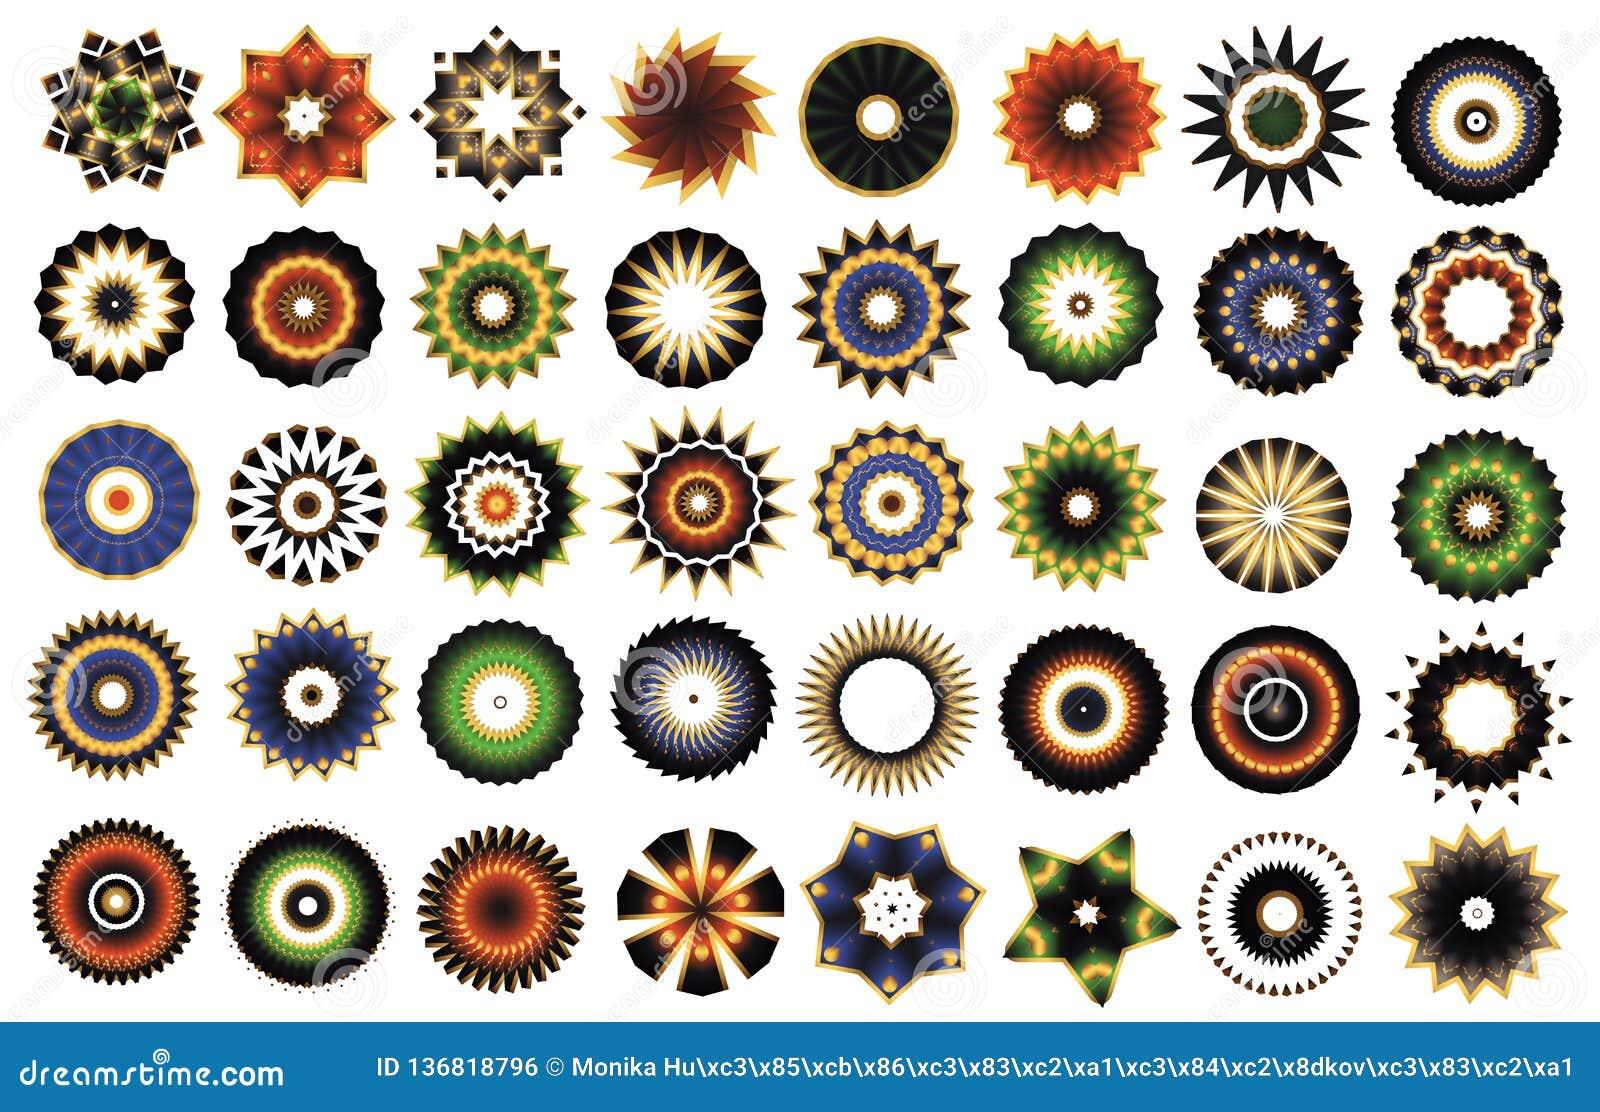 Rosette Guillocheblumenmandalafarbikonen-Sammlungsvektor 40 Stücke